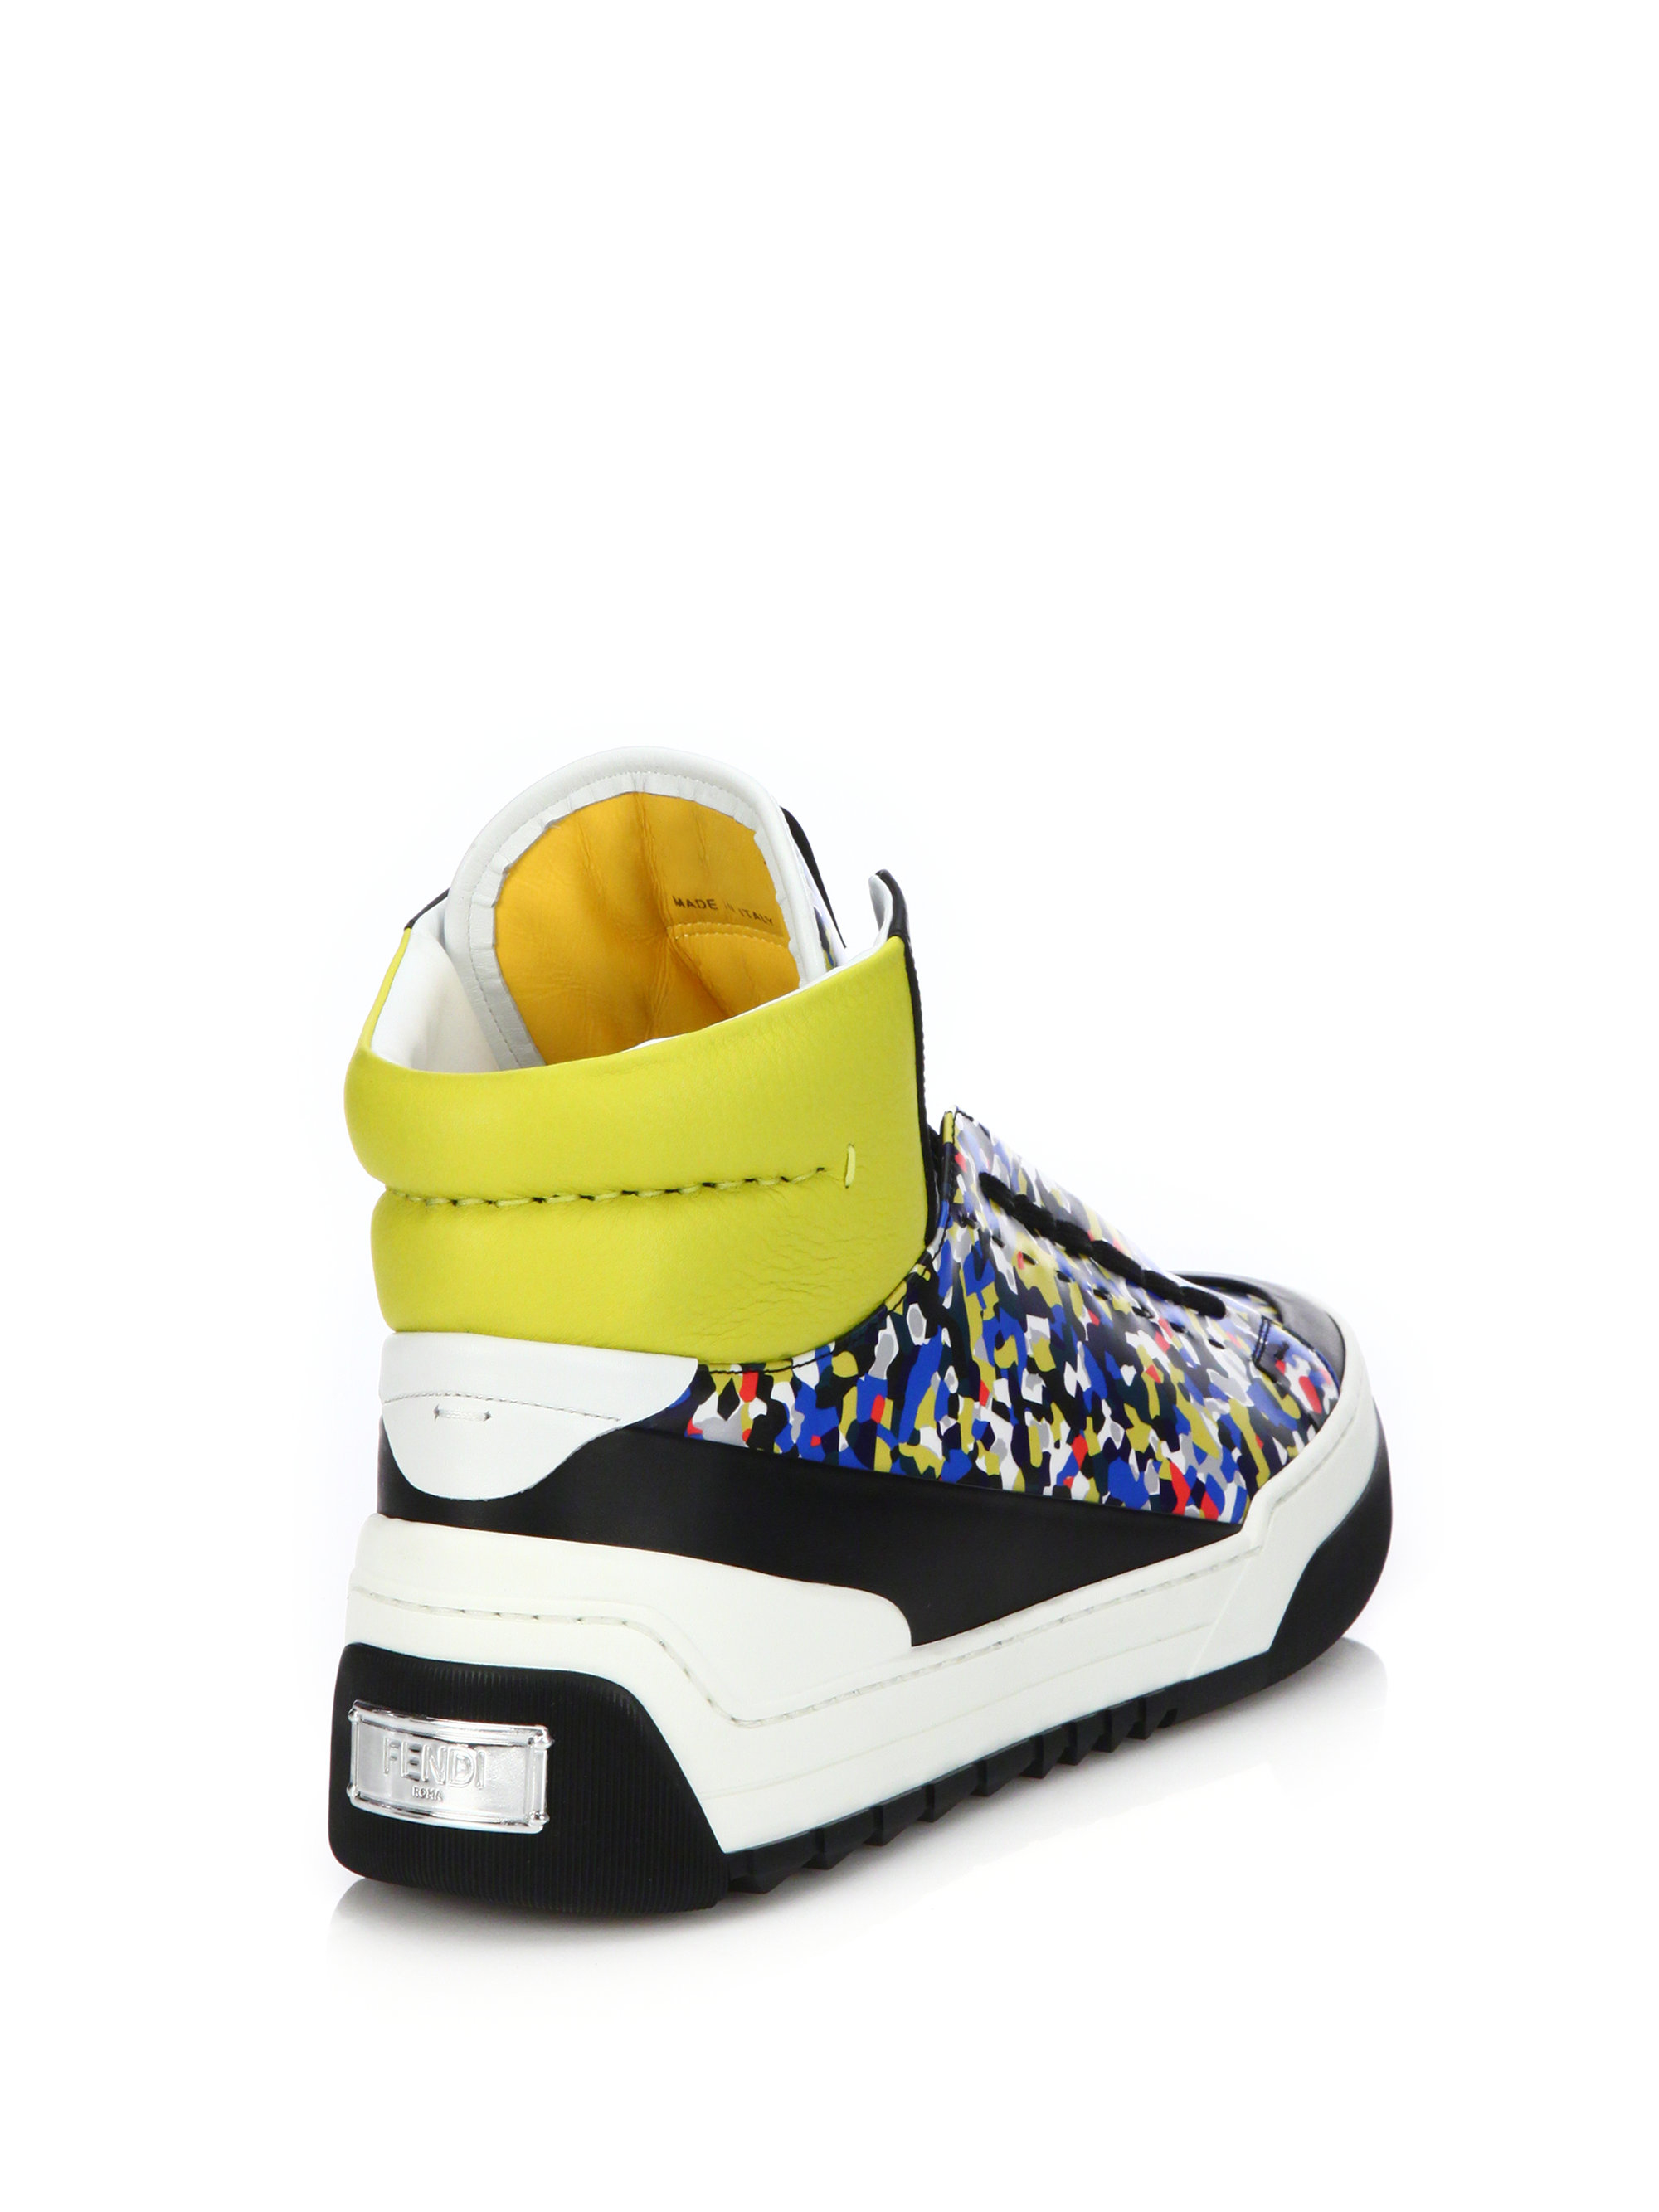 2d7f4948e0ac89 Fendi Multi Color High Top Sneakers for Men Lyst